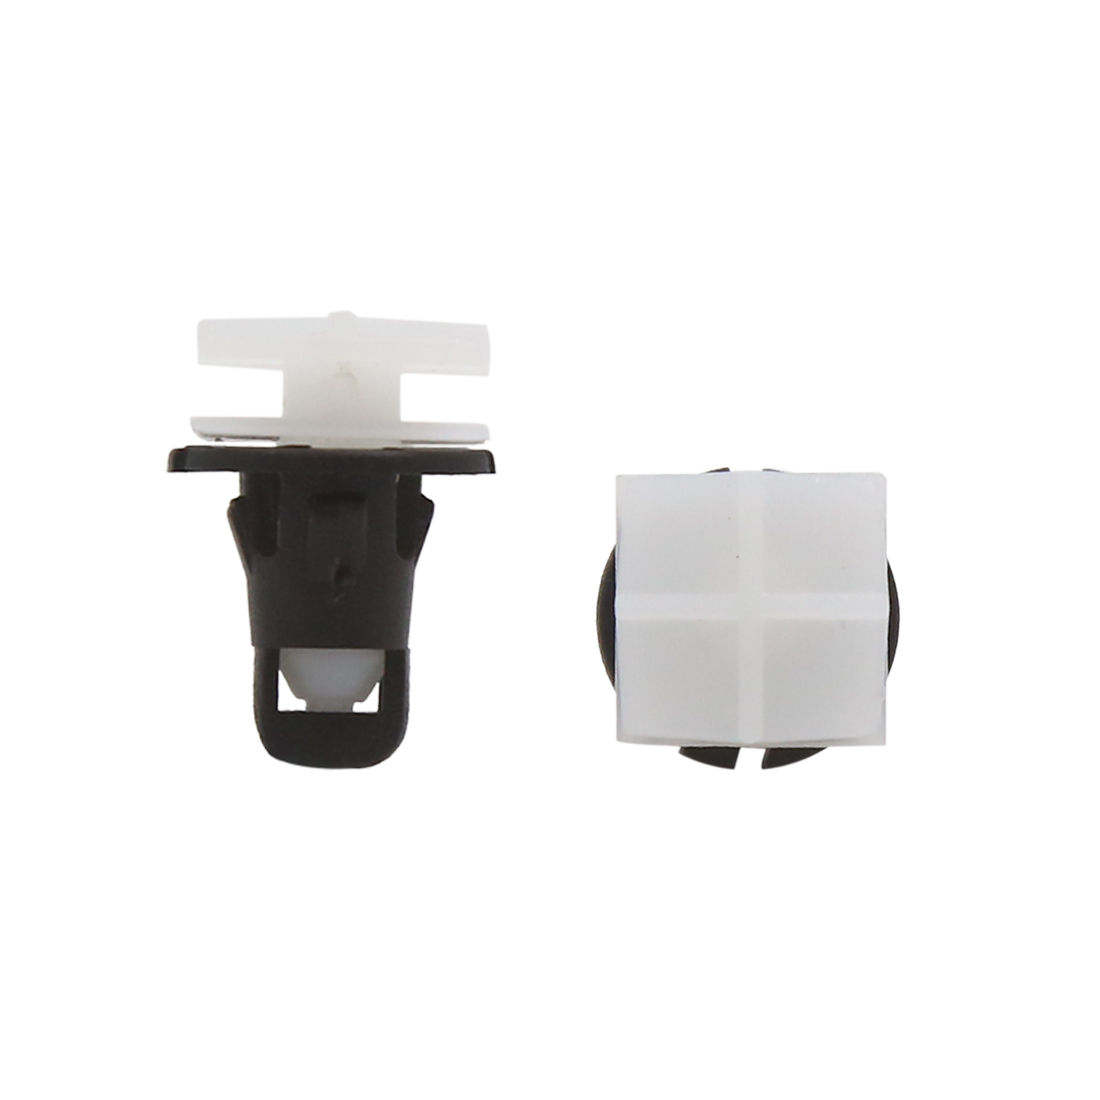 100Pcs Black White Plastic Clips Push Pin Retainer Rivets Fender Fastener 10mm